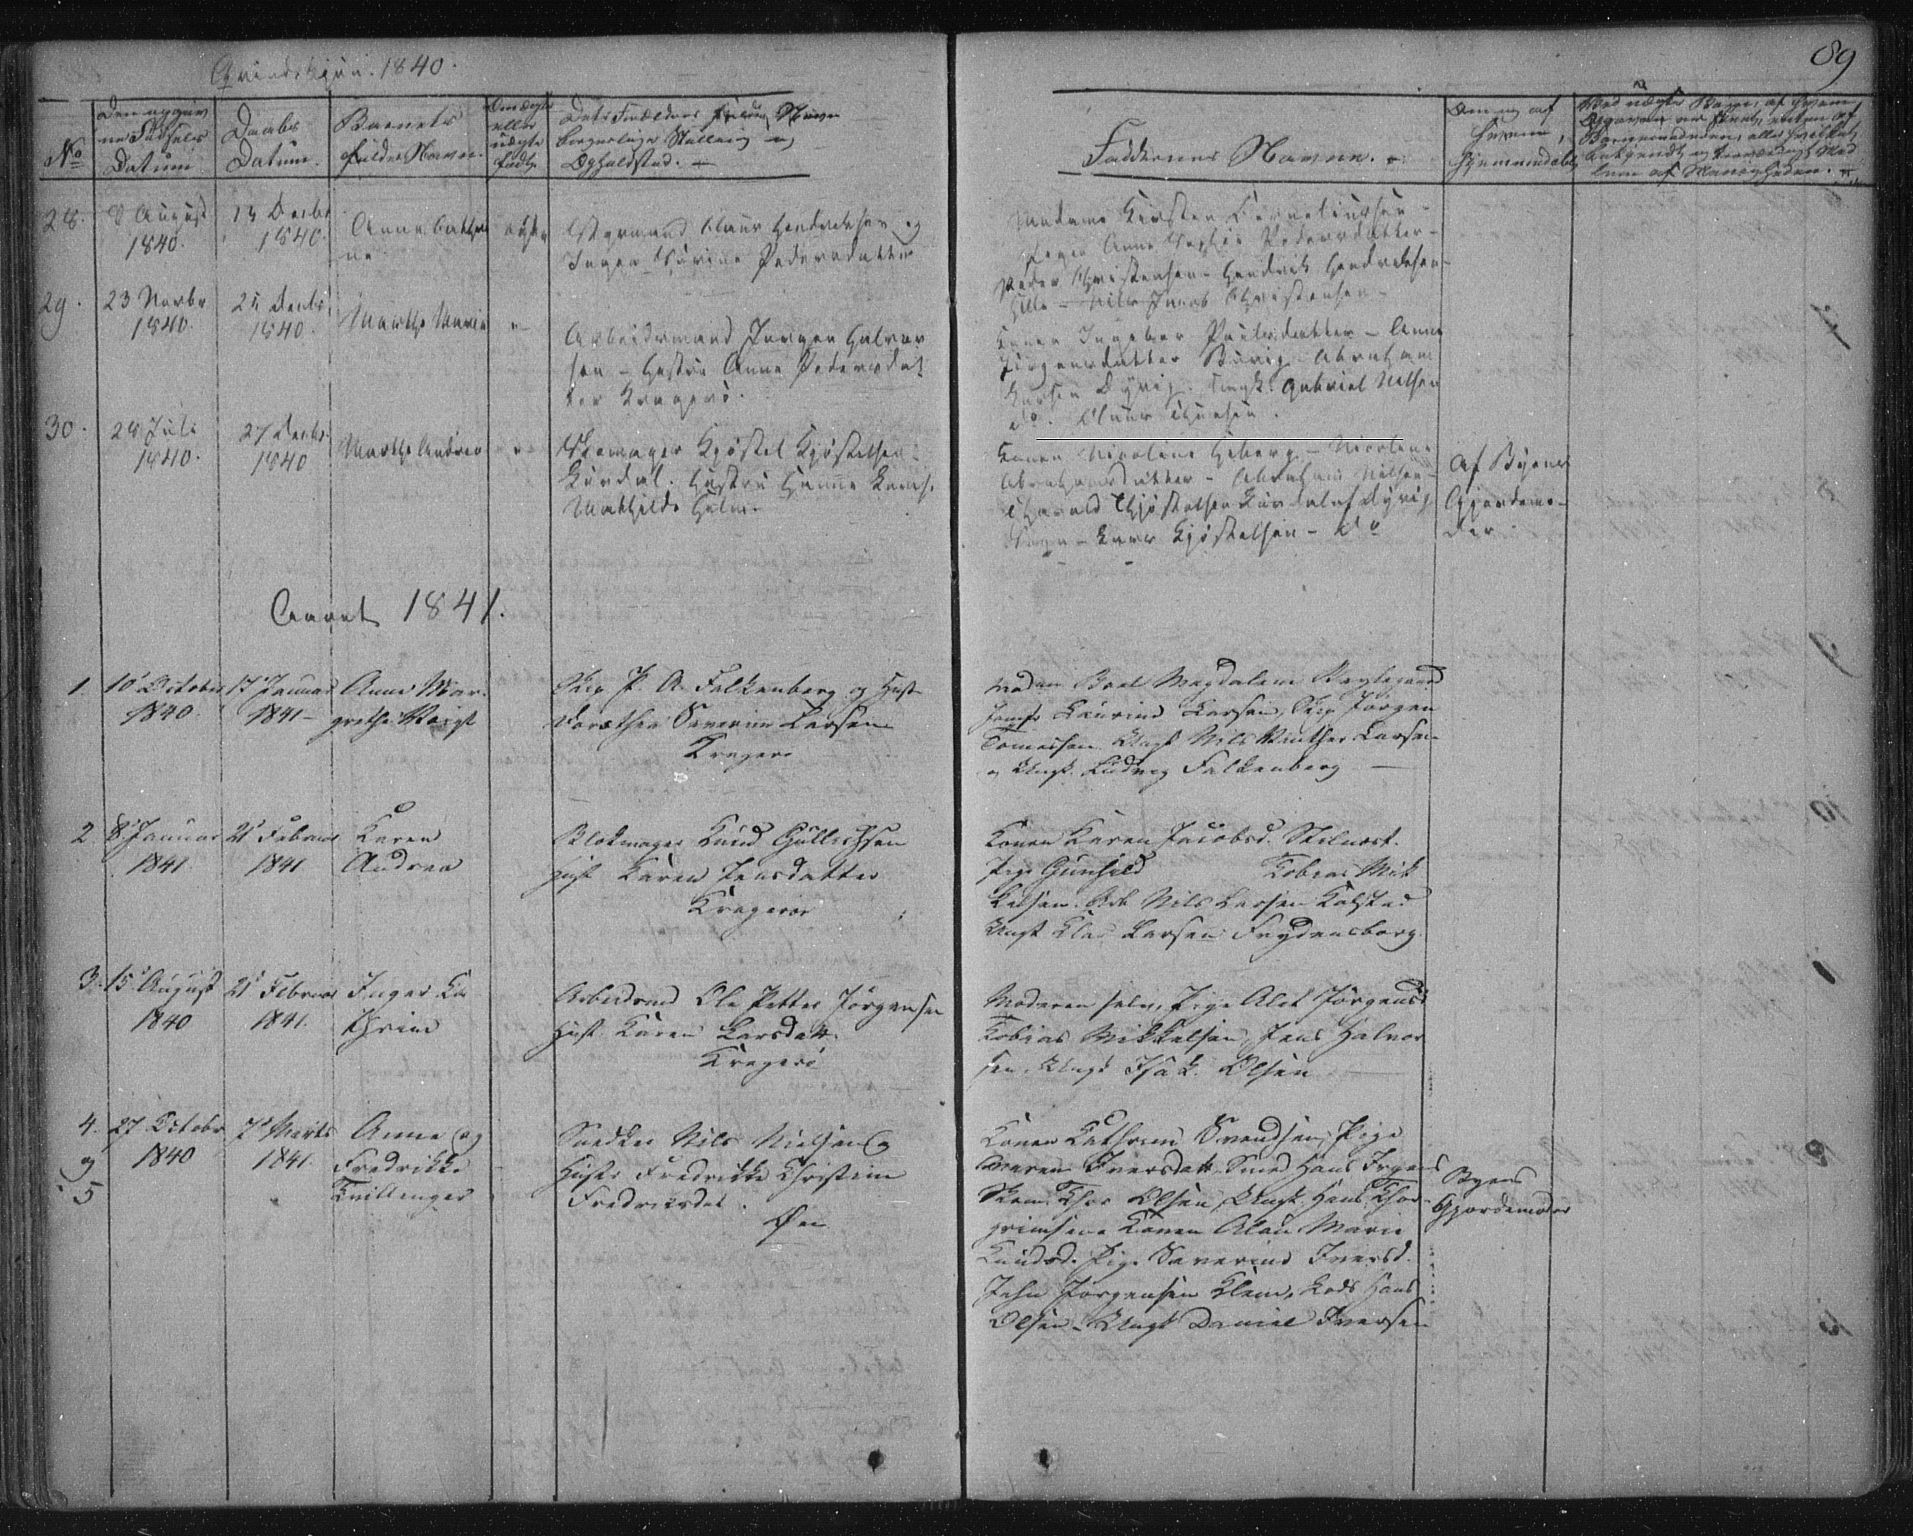 SAKO, Kragerø kirkebøker, F/Fa/L0005: Parish register (official) no. 5, 1832-1847, p. 89